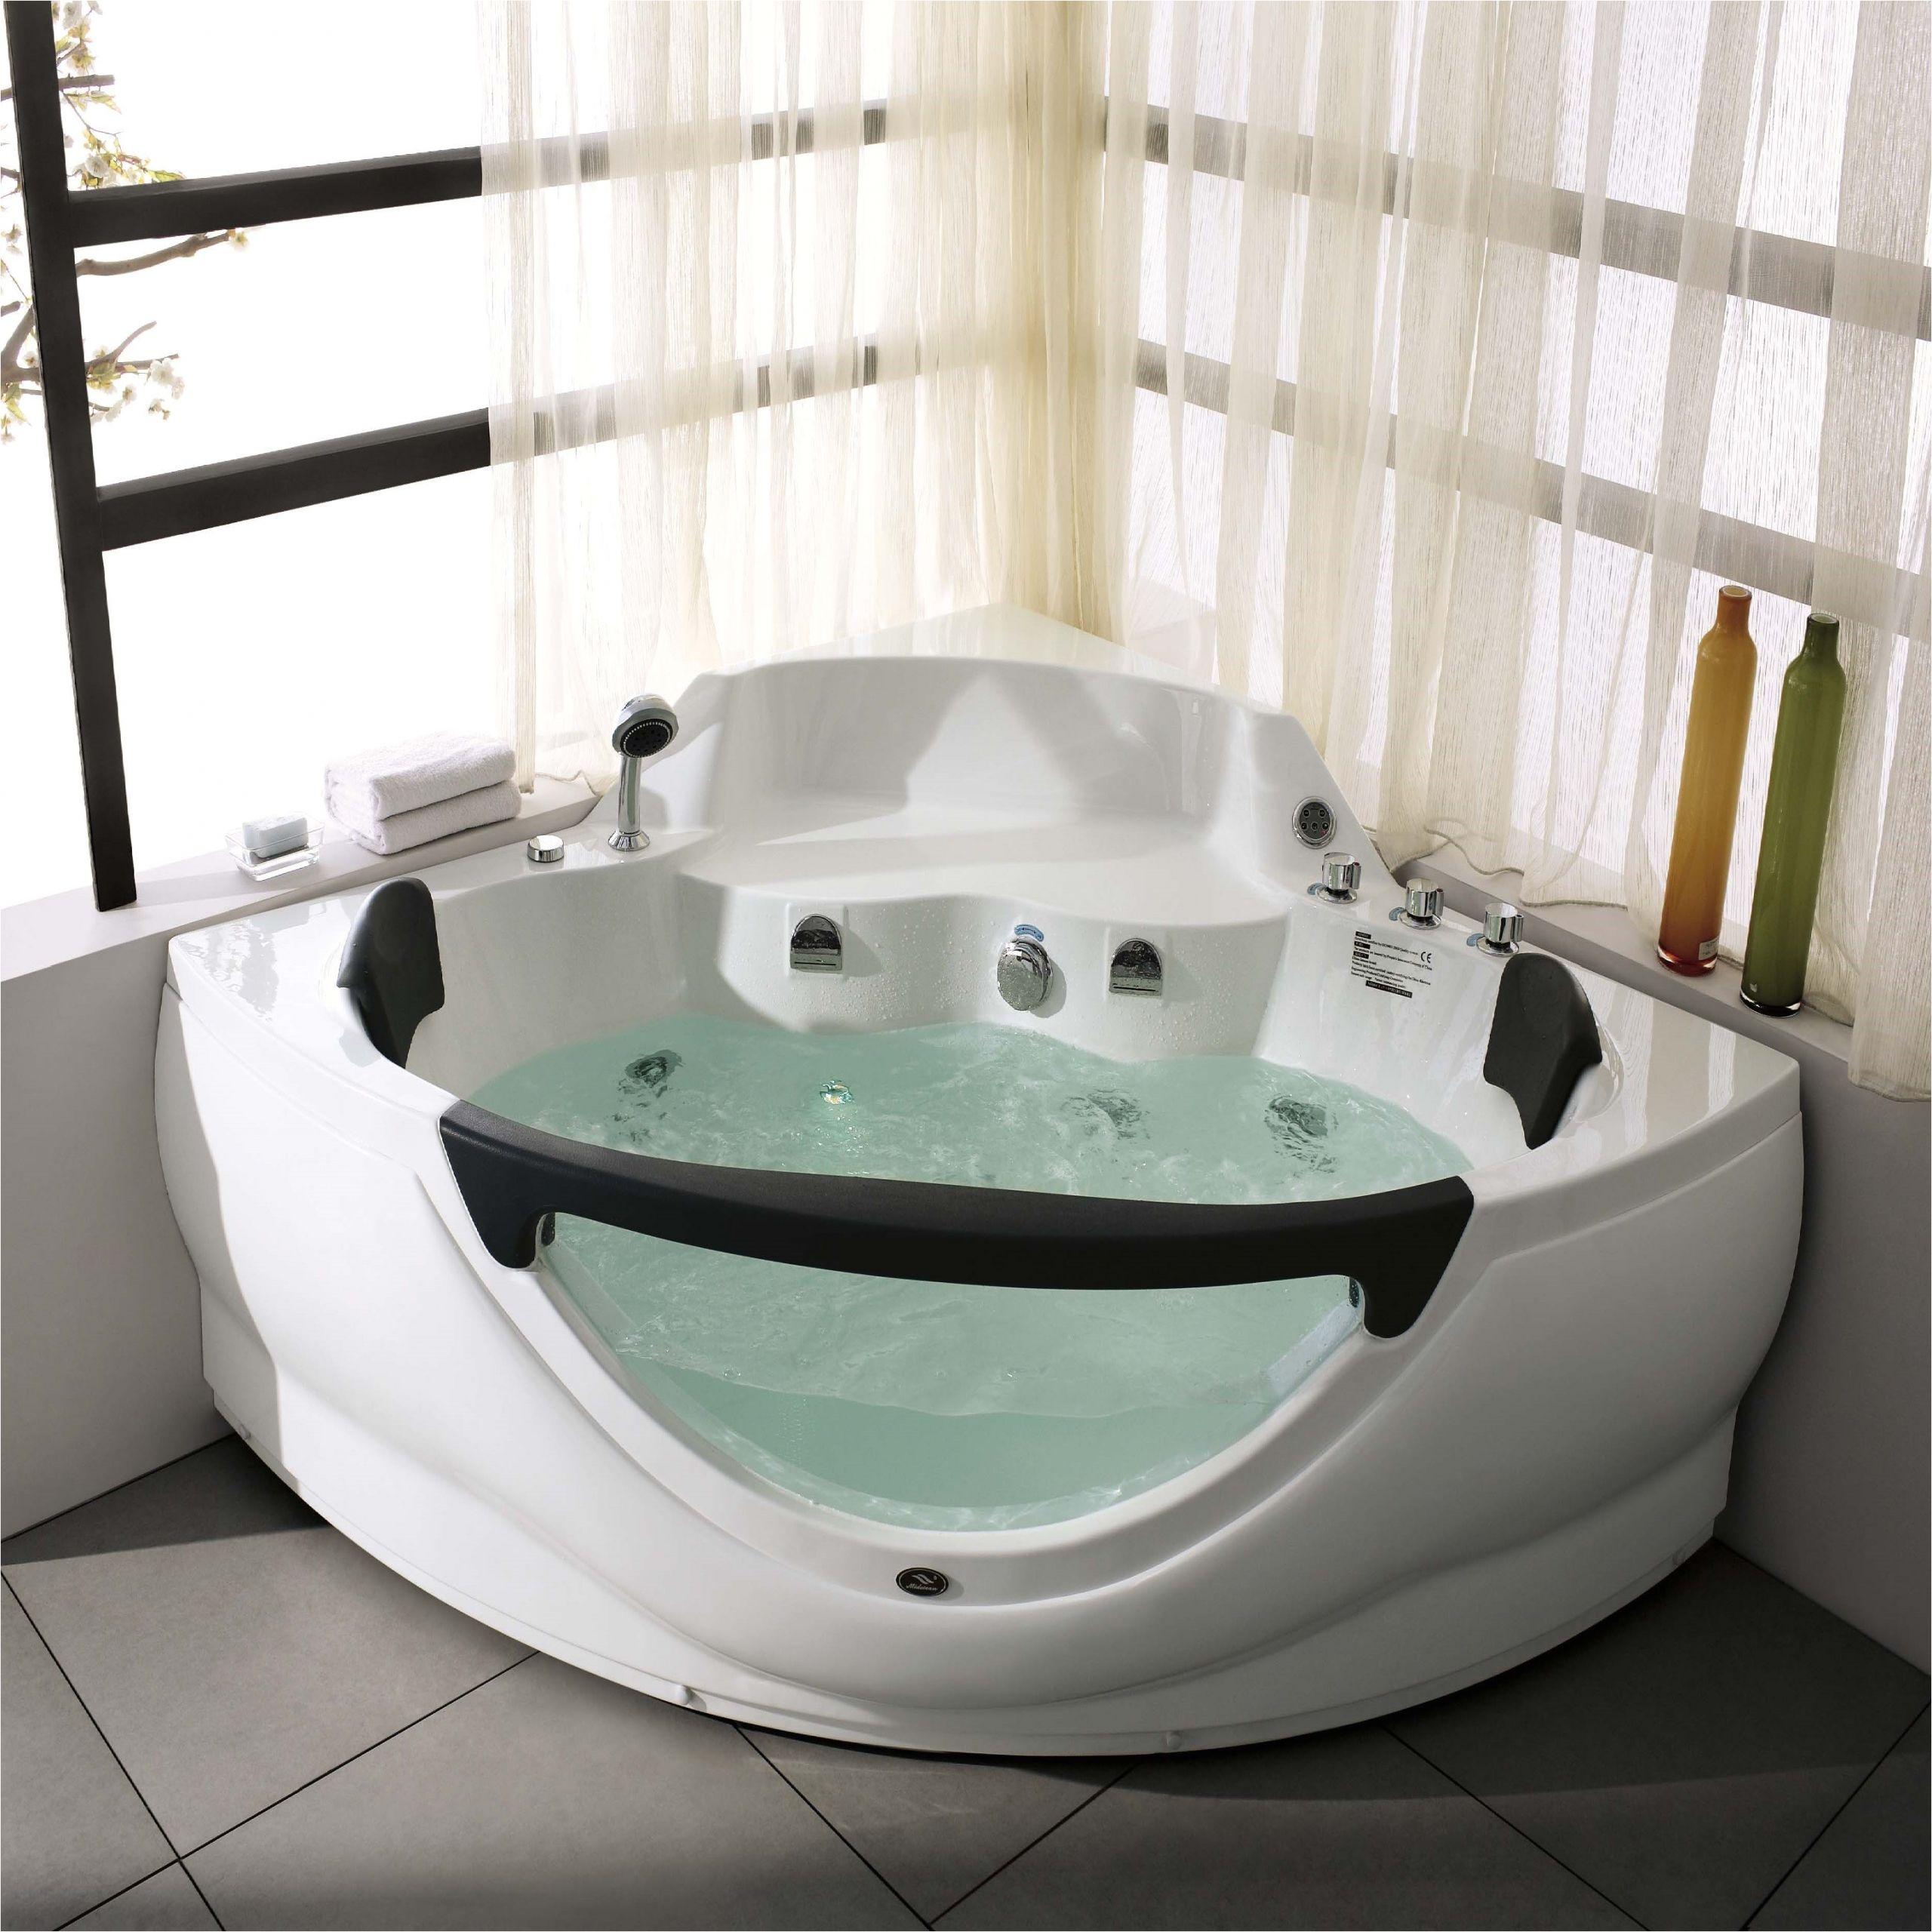 cozumel luxury whirlpool tub